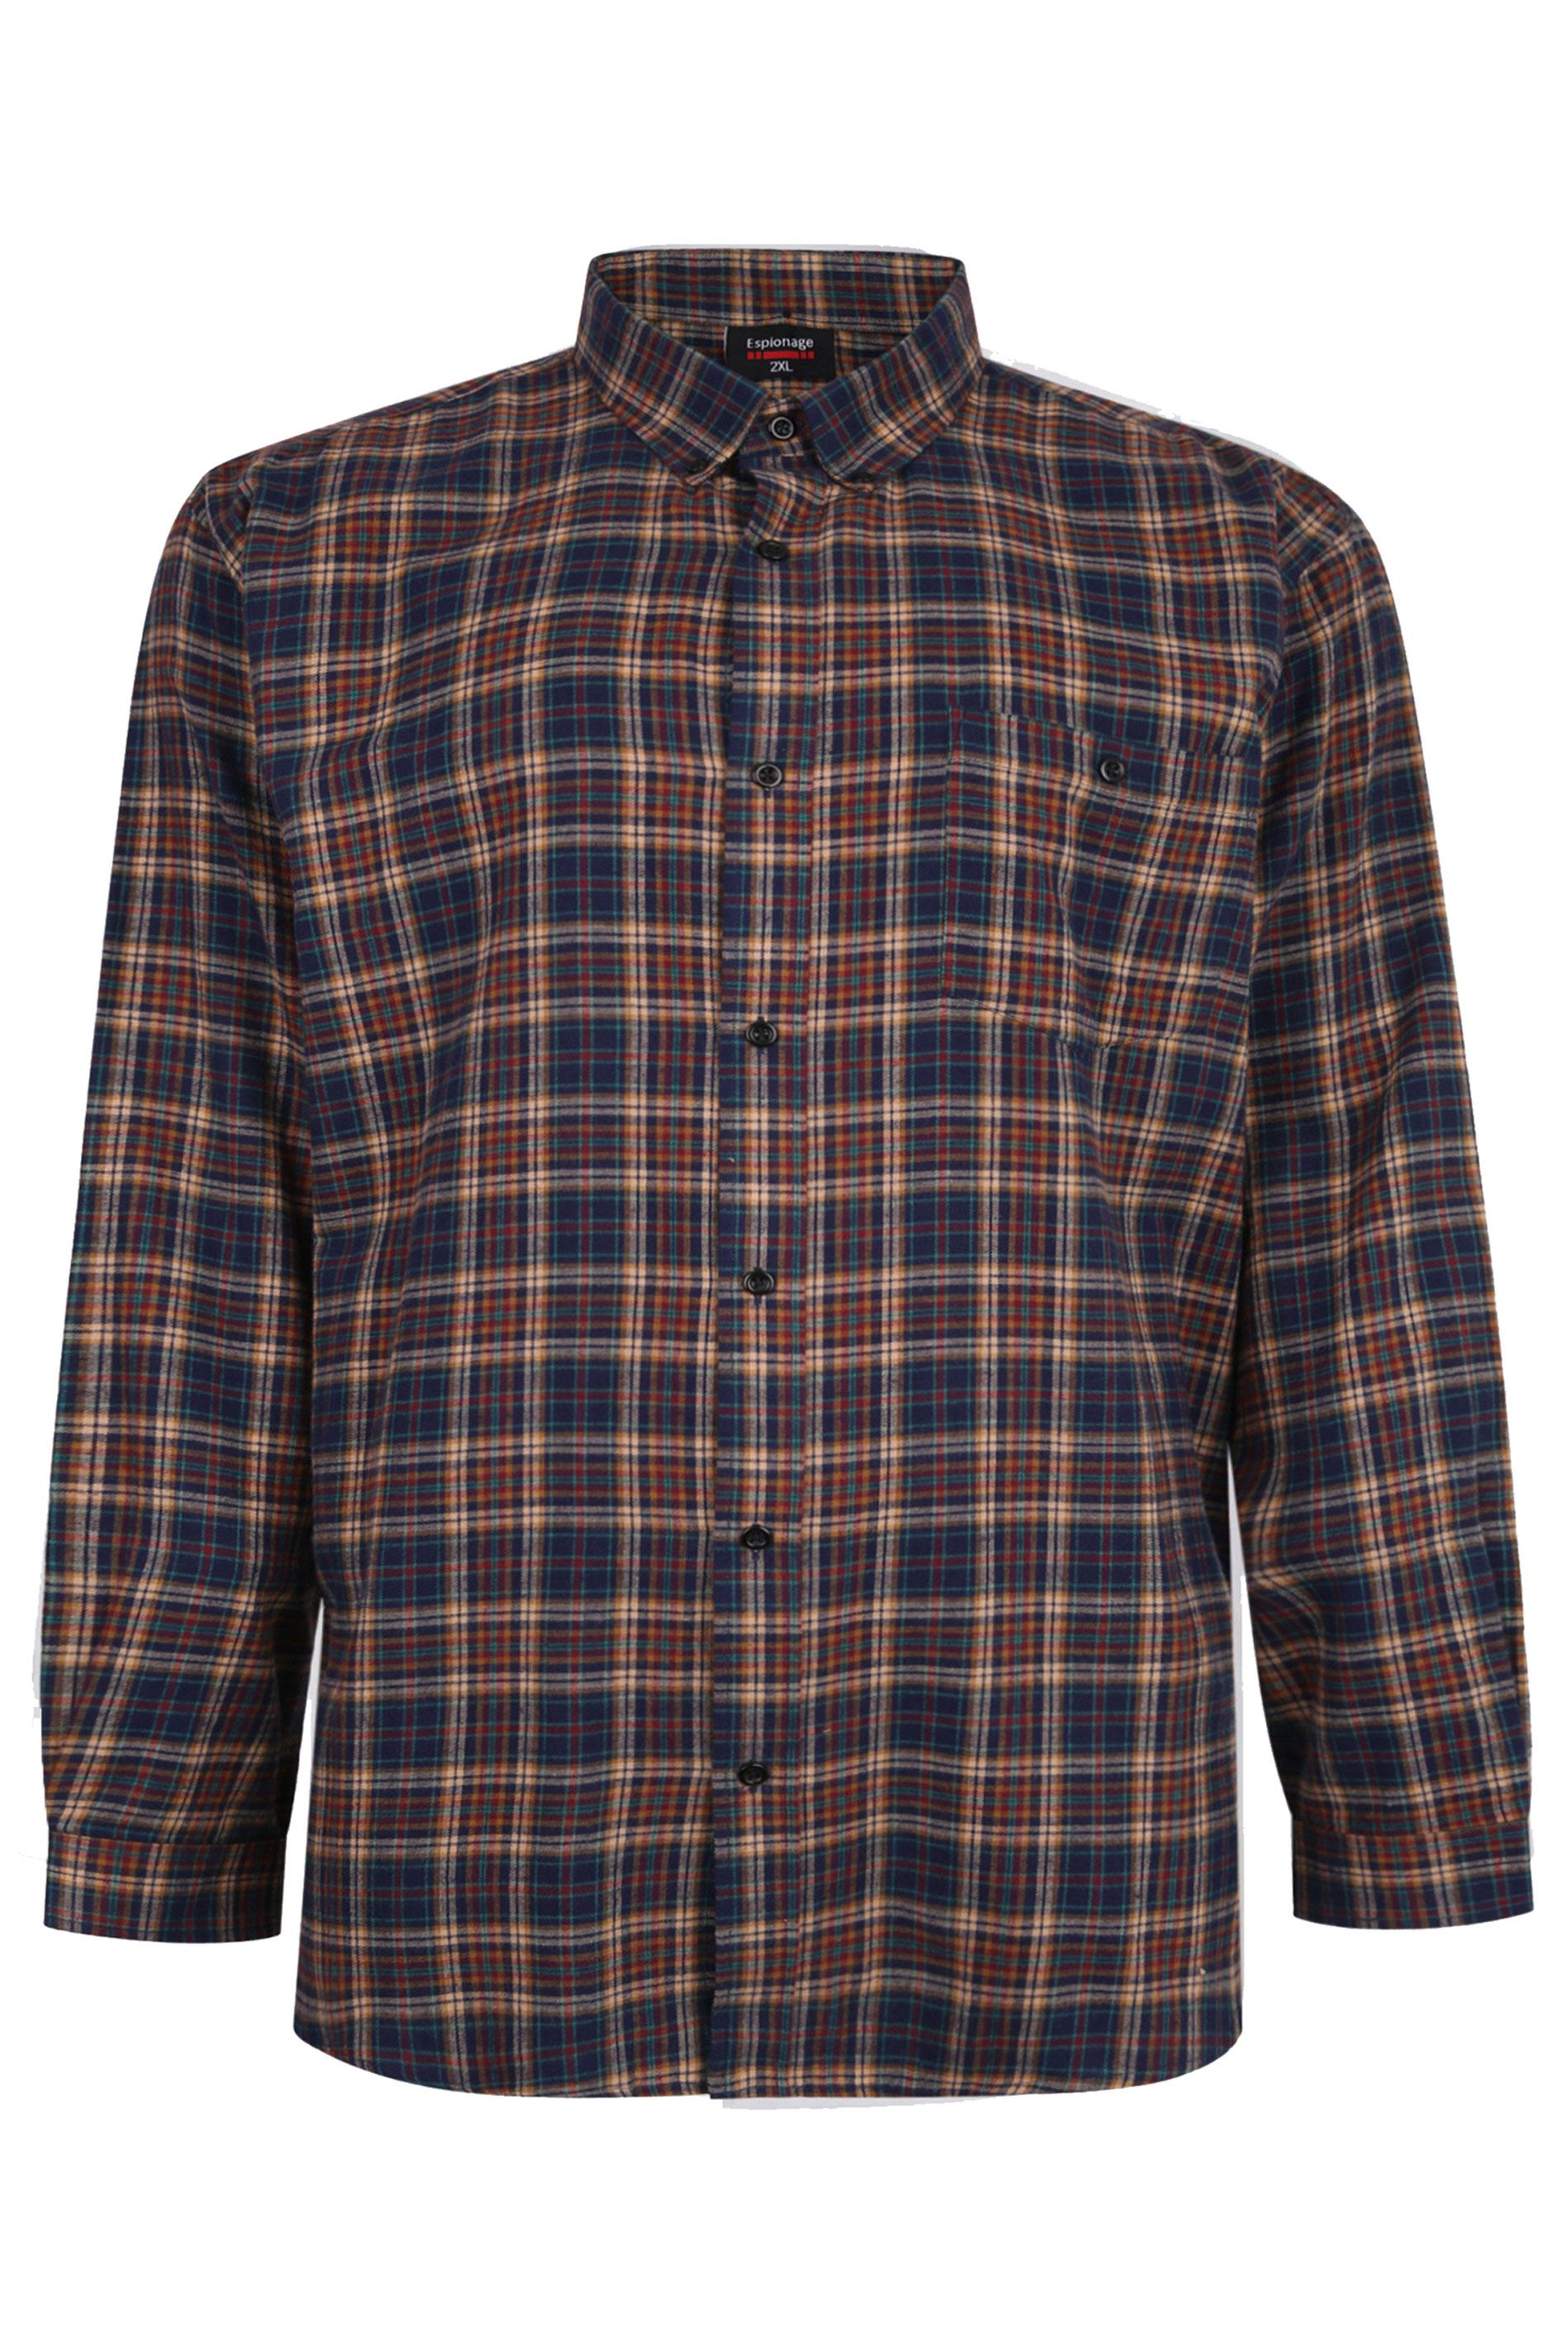 ESPIONAGE Navy & Mustard Check Brushed Cotton Flannel Shirt